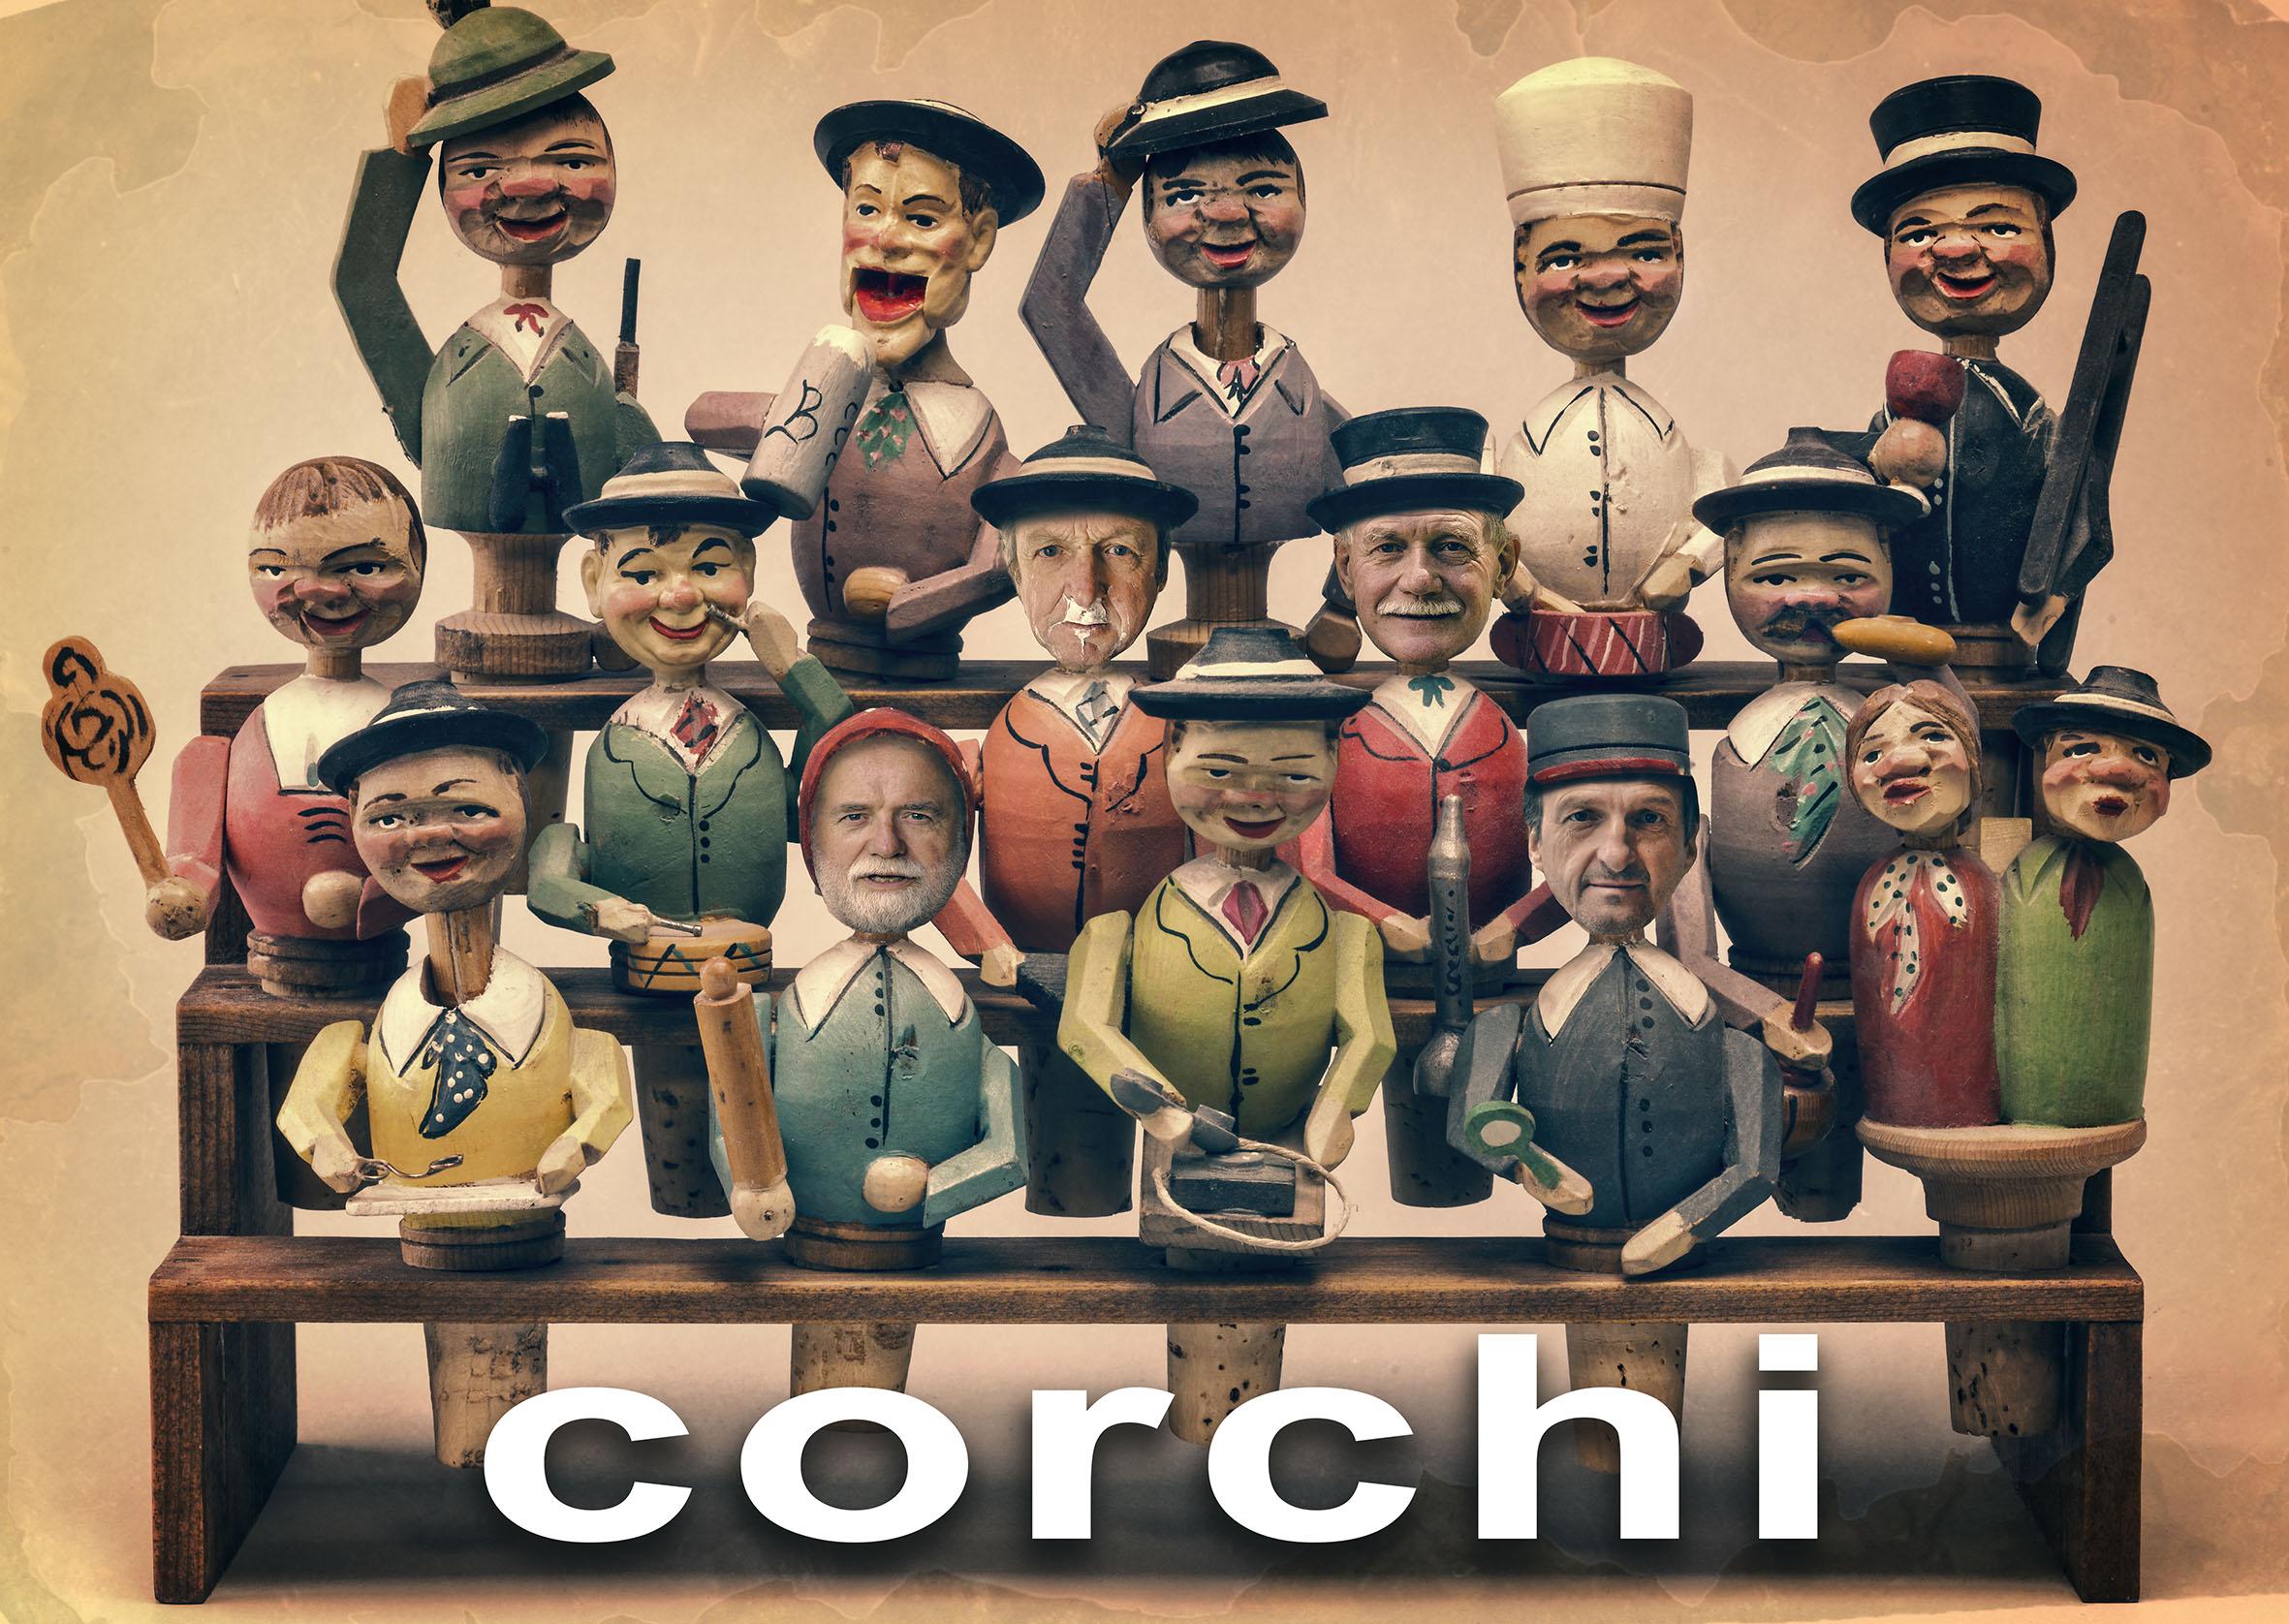 Sommavilla Ausstellung Corchi - Stöpsel Adler Art